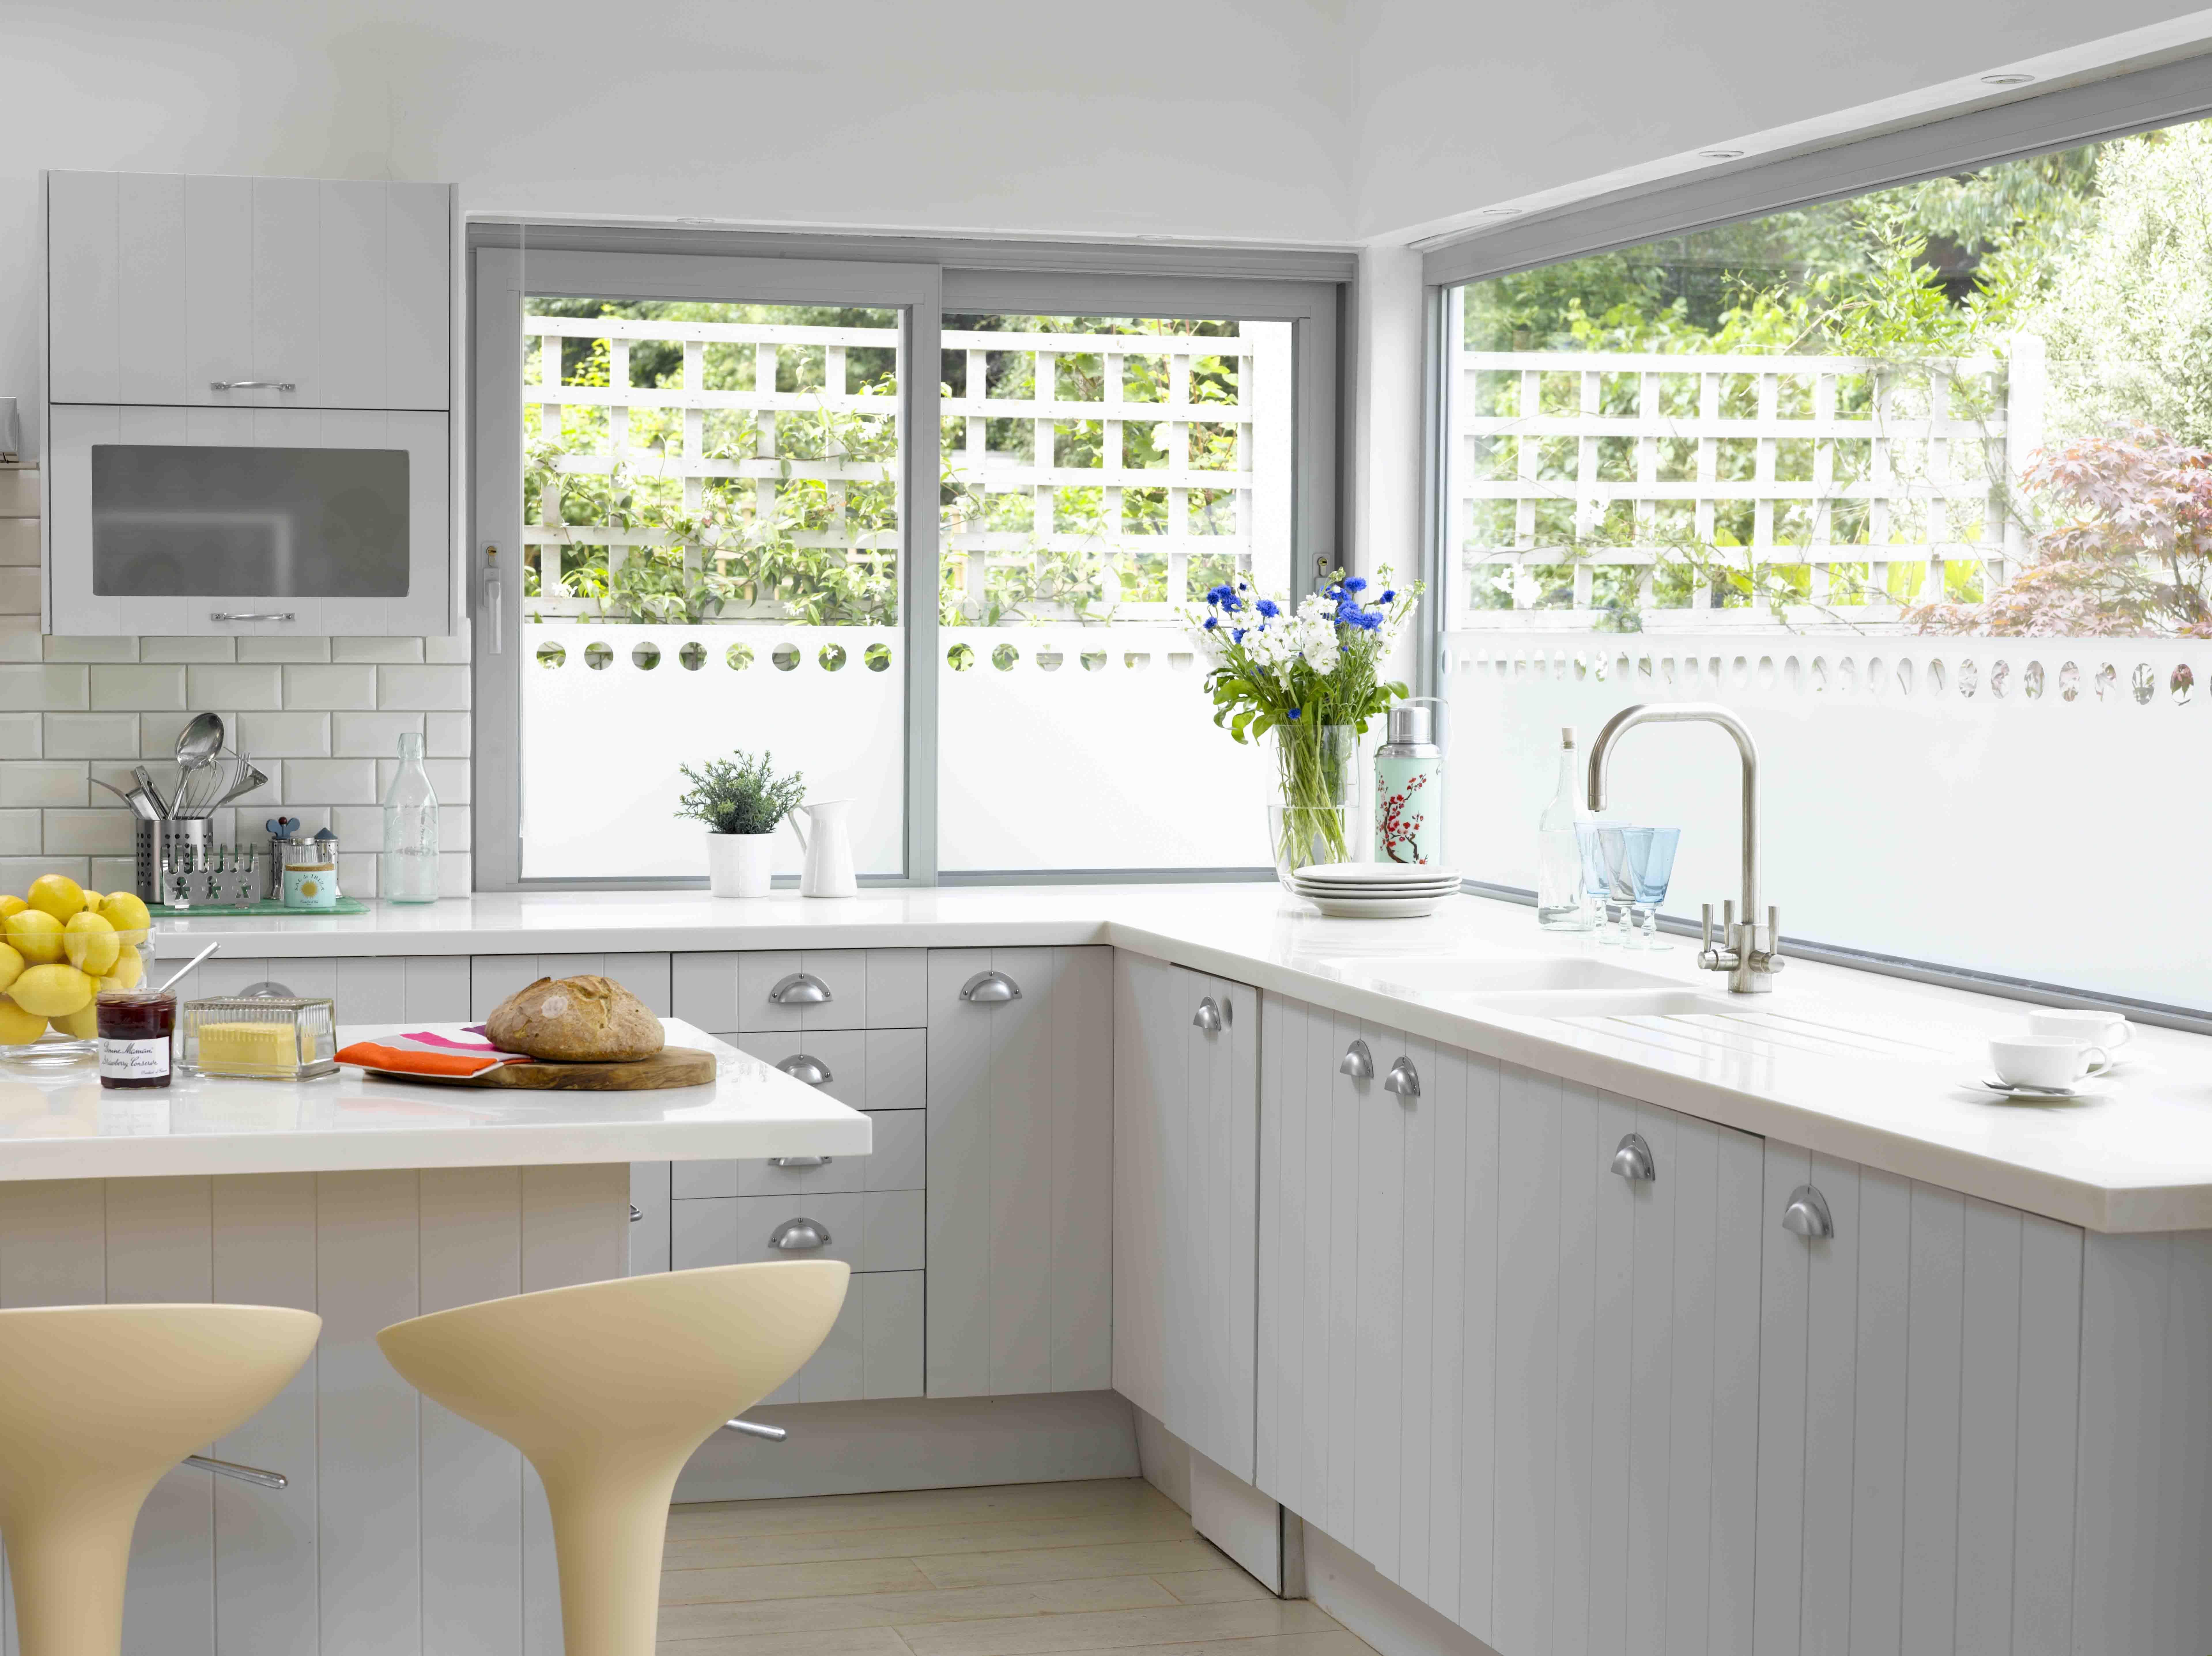 Bemerkenswert Küchenfenster Ideen Und Fenster Behandlung Lösung ...